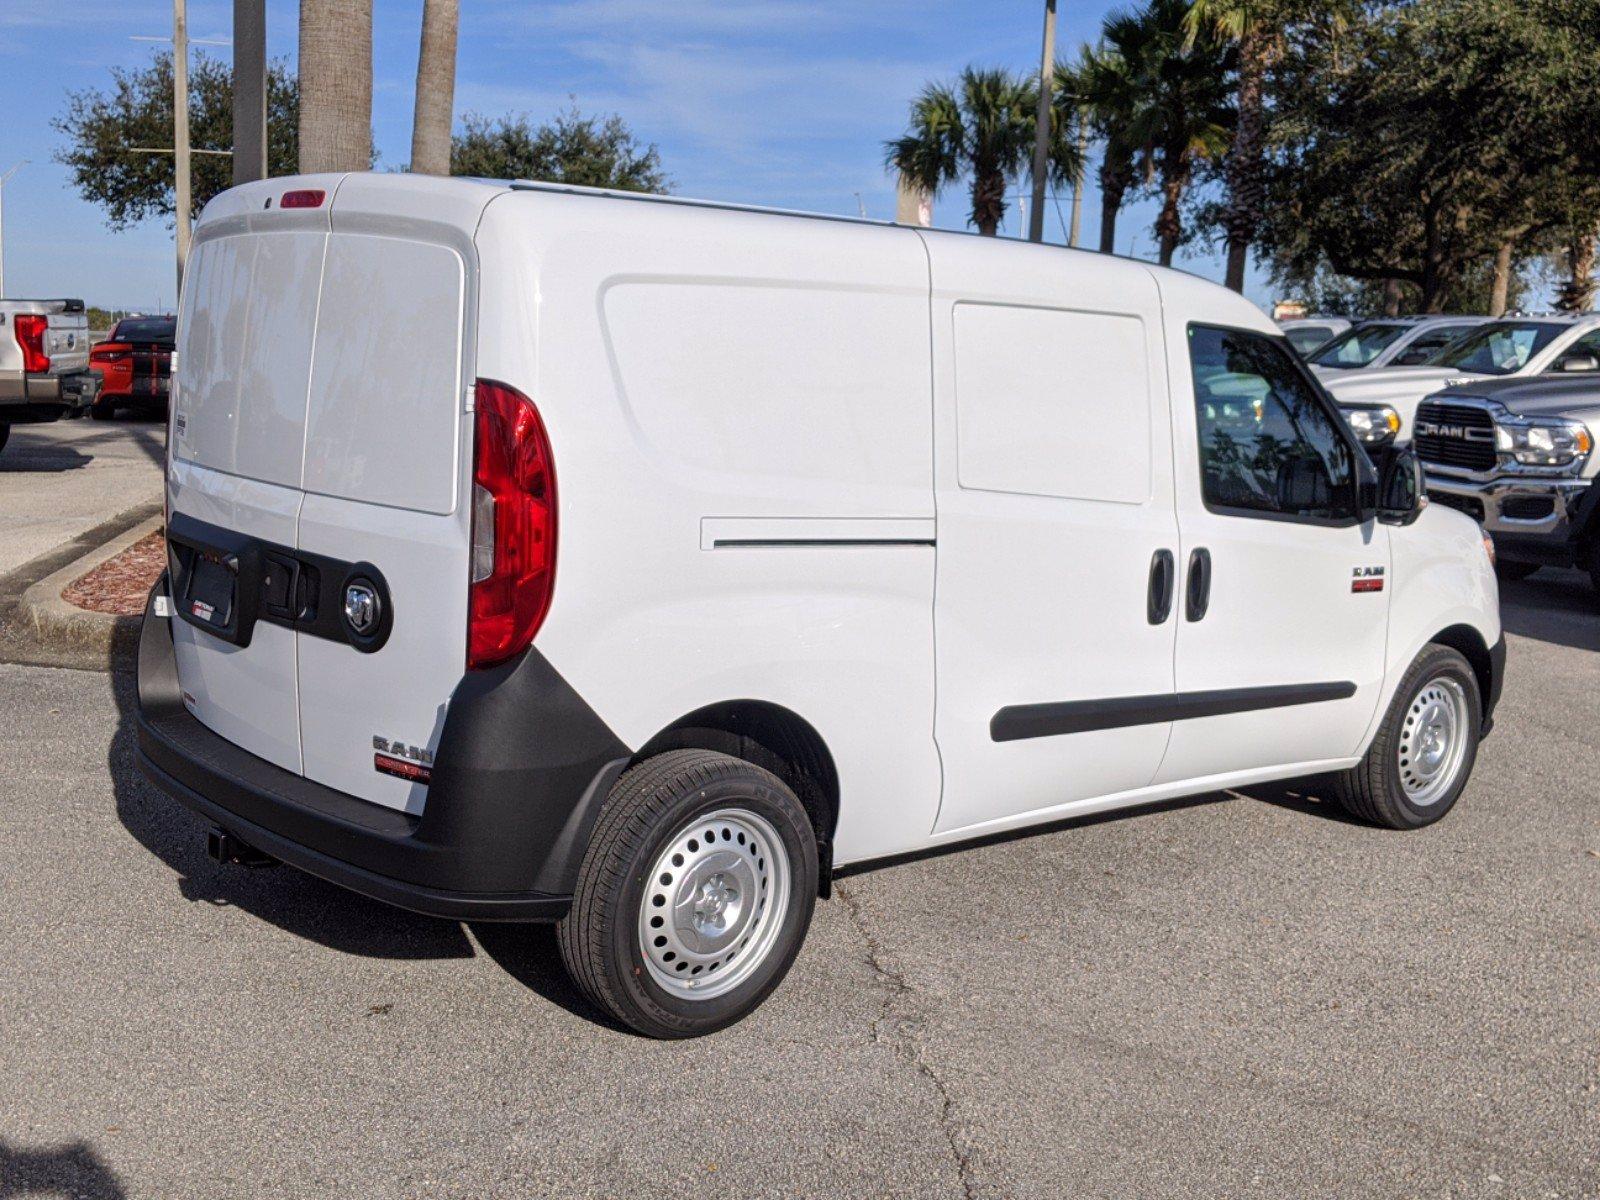 2021 Ram ProMaster City FWD, Empty Cargo Van #R21166 - photo 1